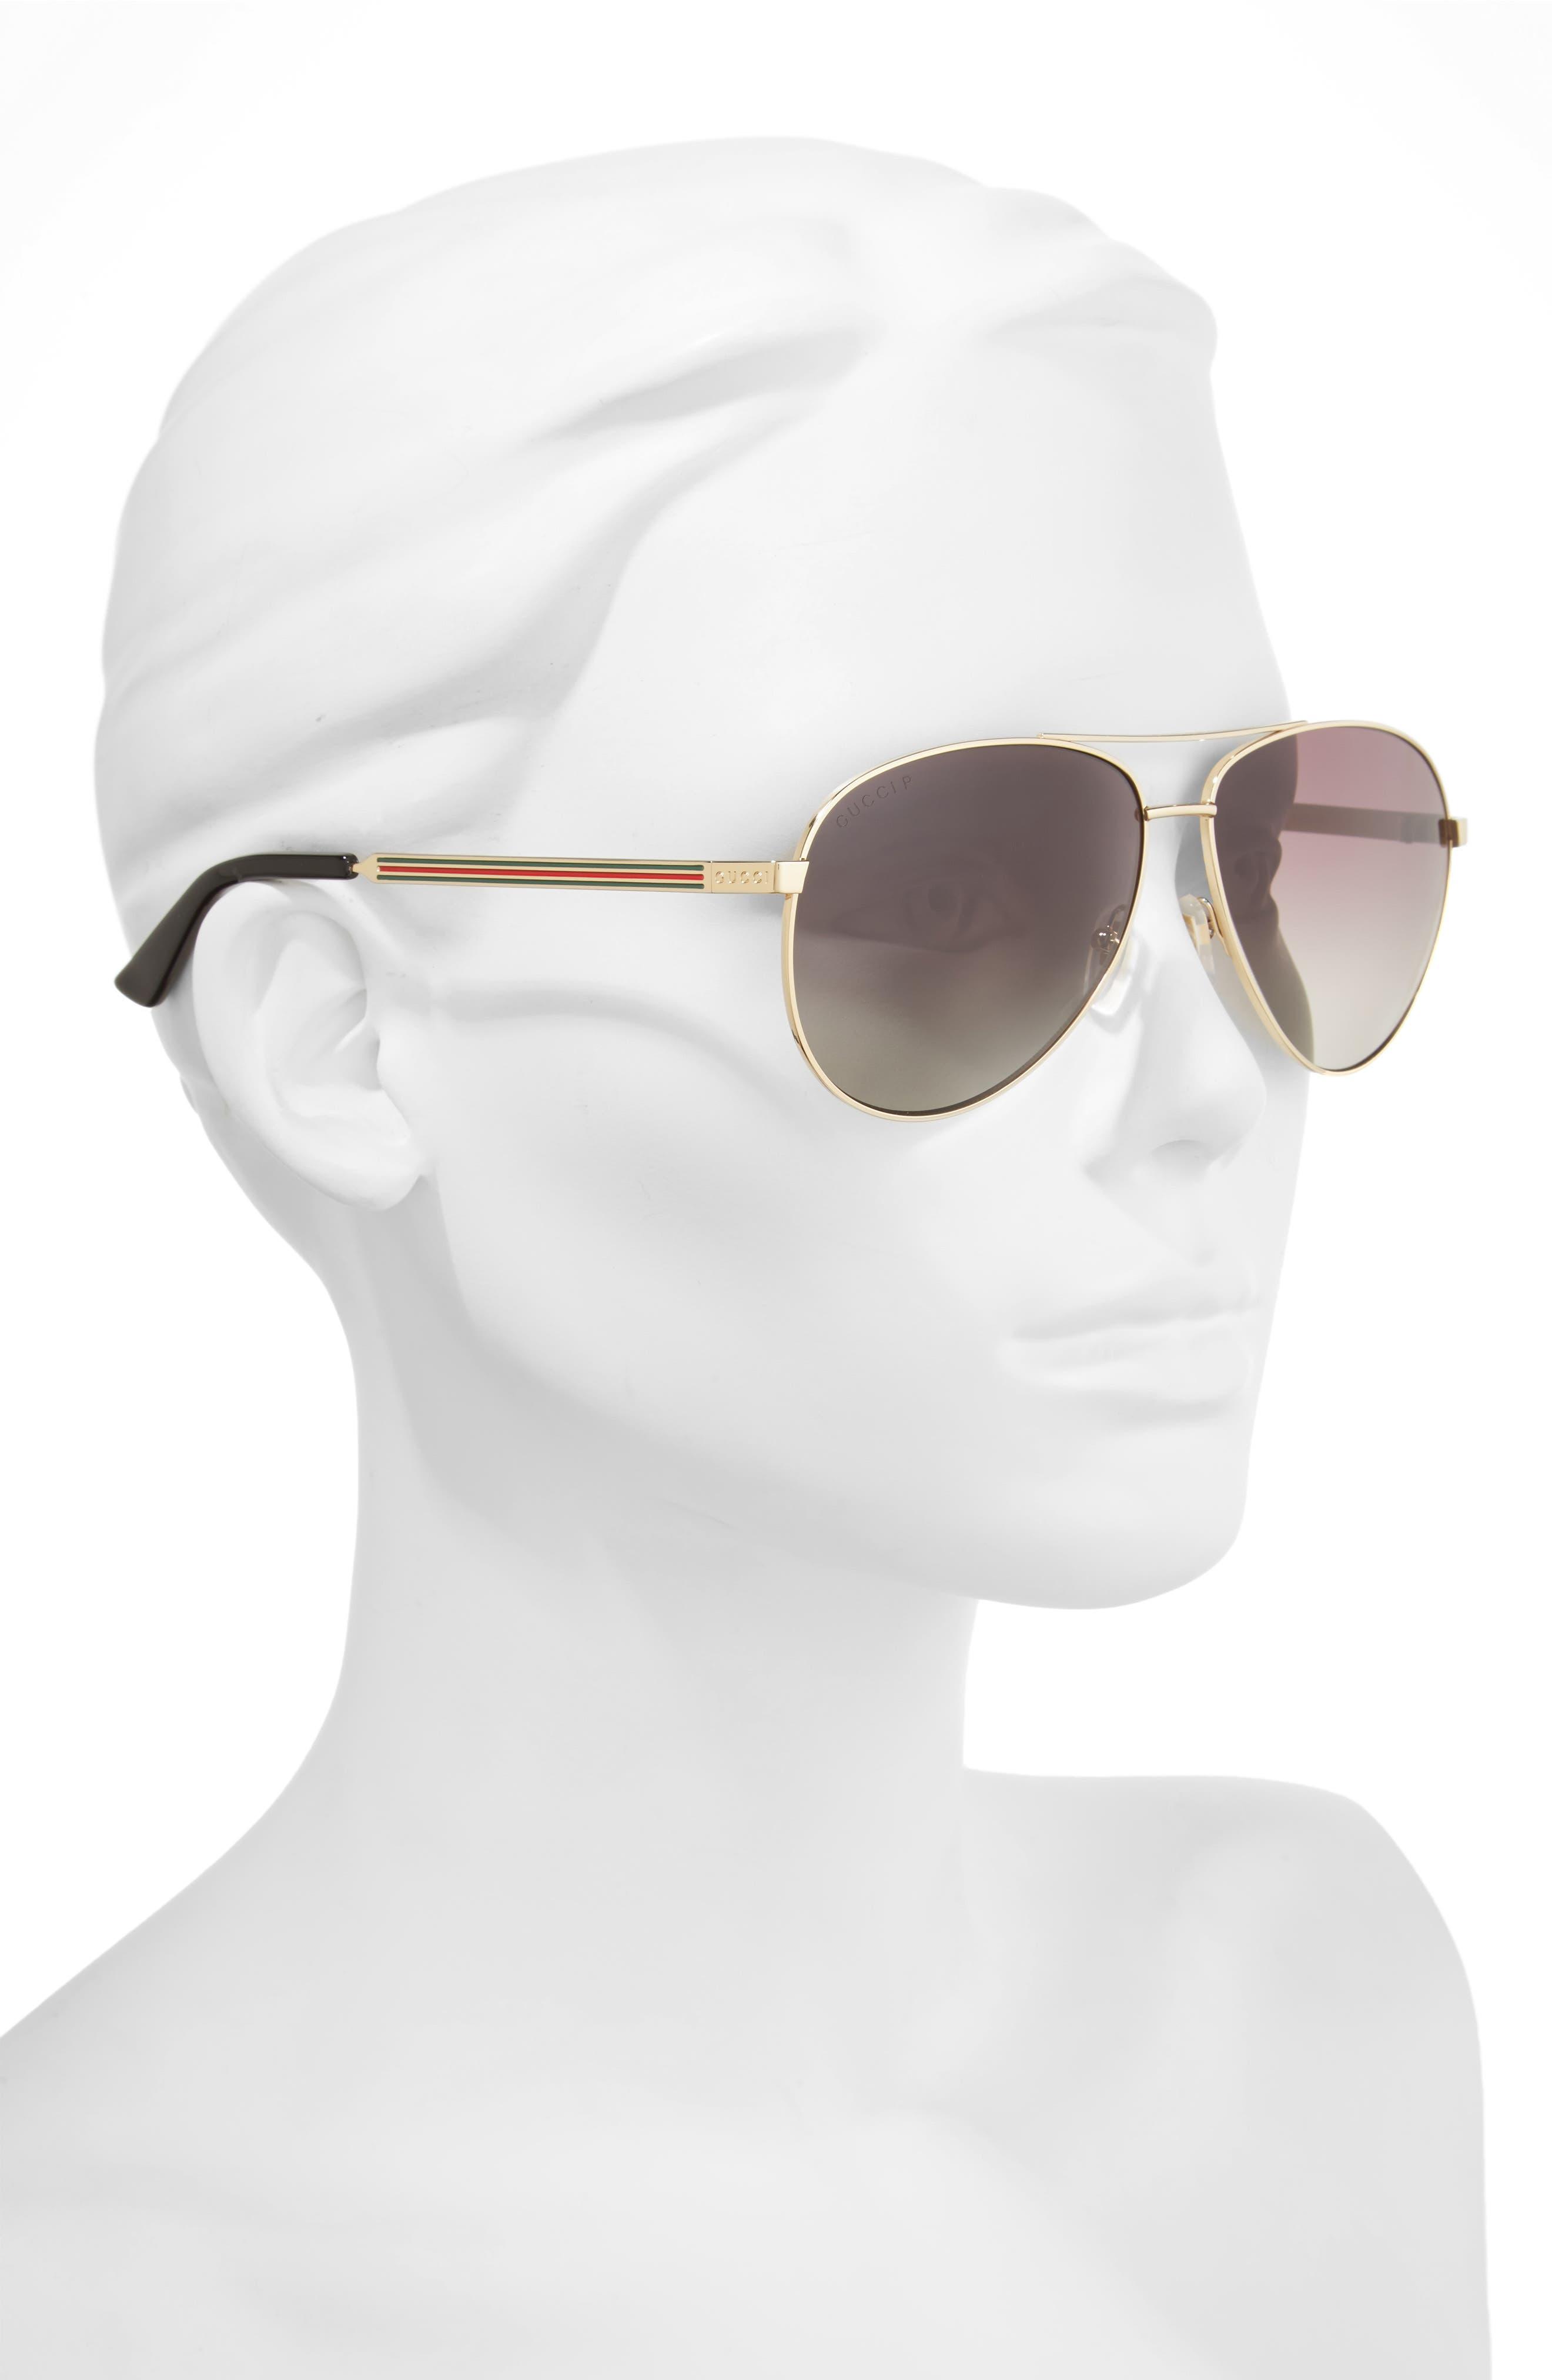 61mm Polarized Aviator Sunglasses,                             Alternate thumbnail 2, color,                             710